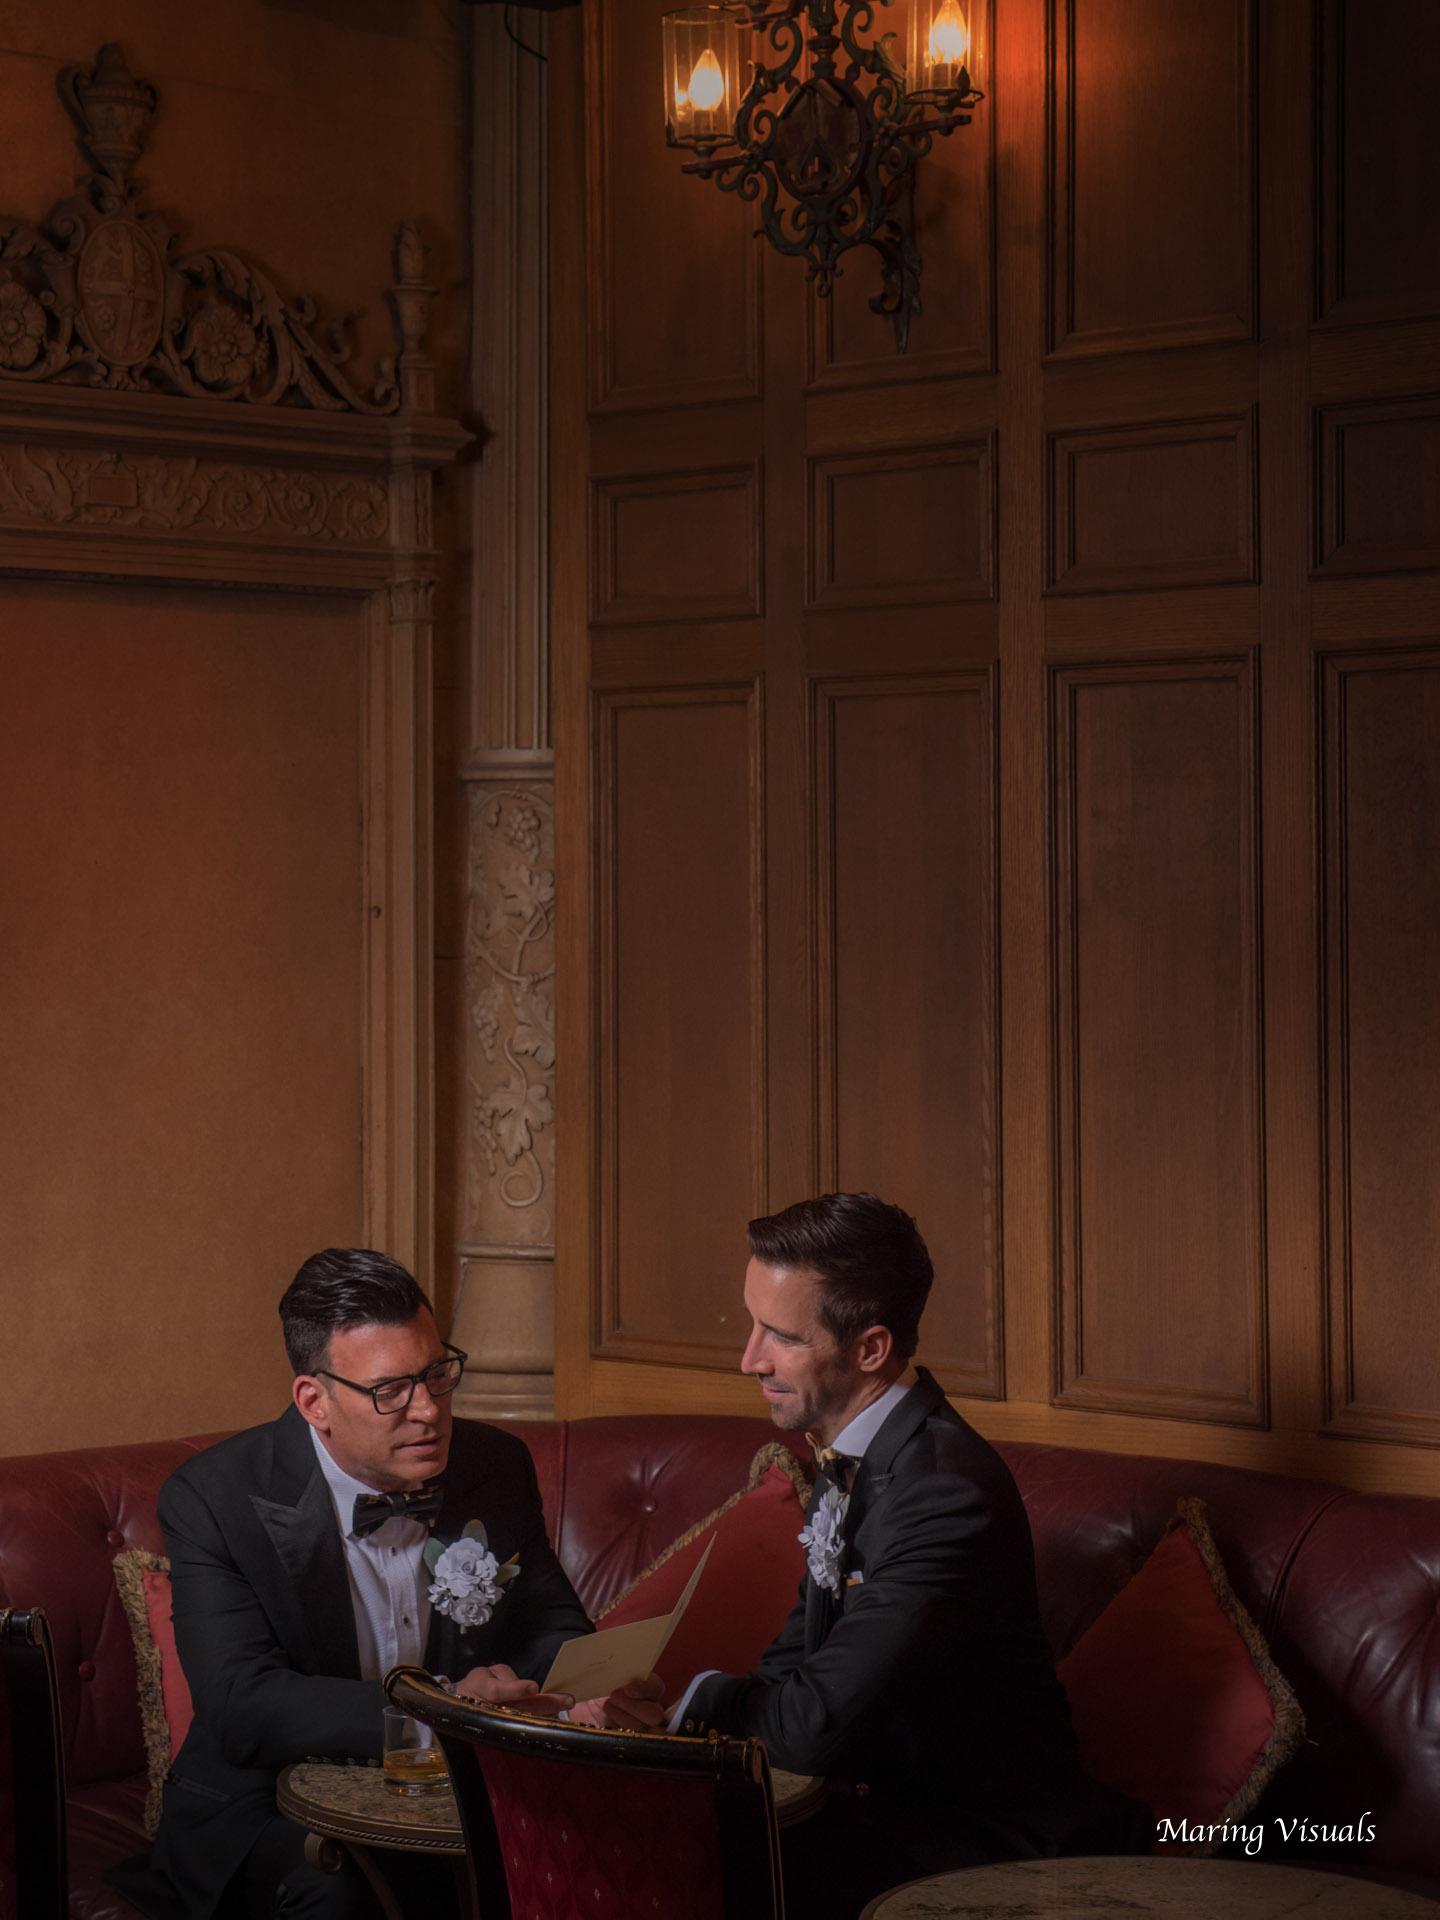 David Tutera Weddings by Maring Visuals 00501.jpg